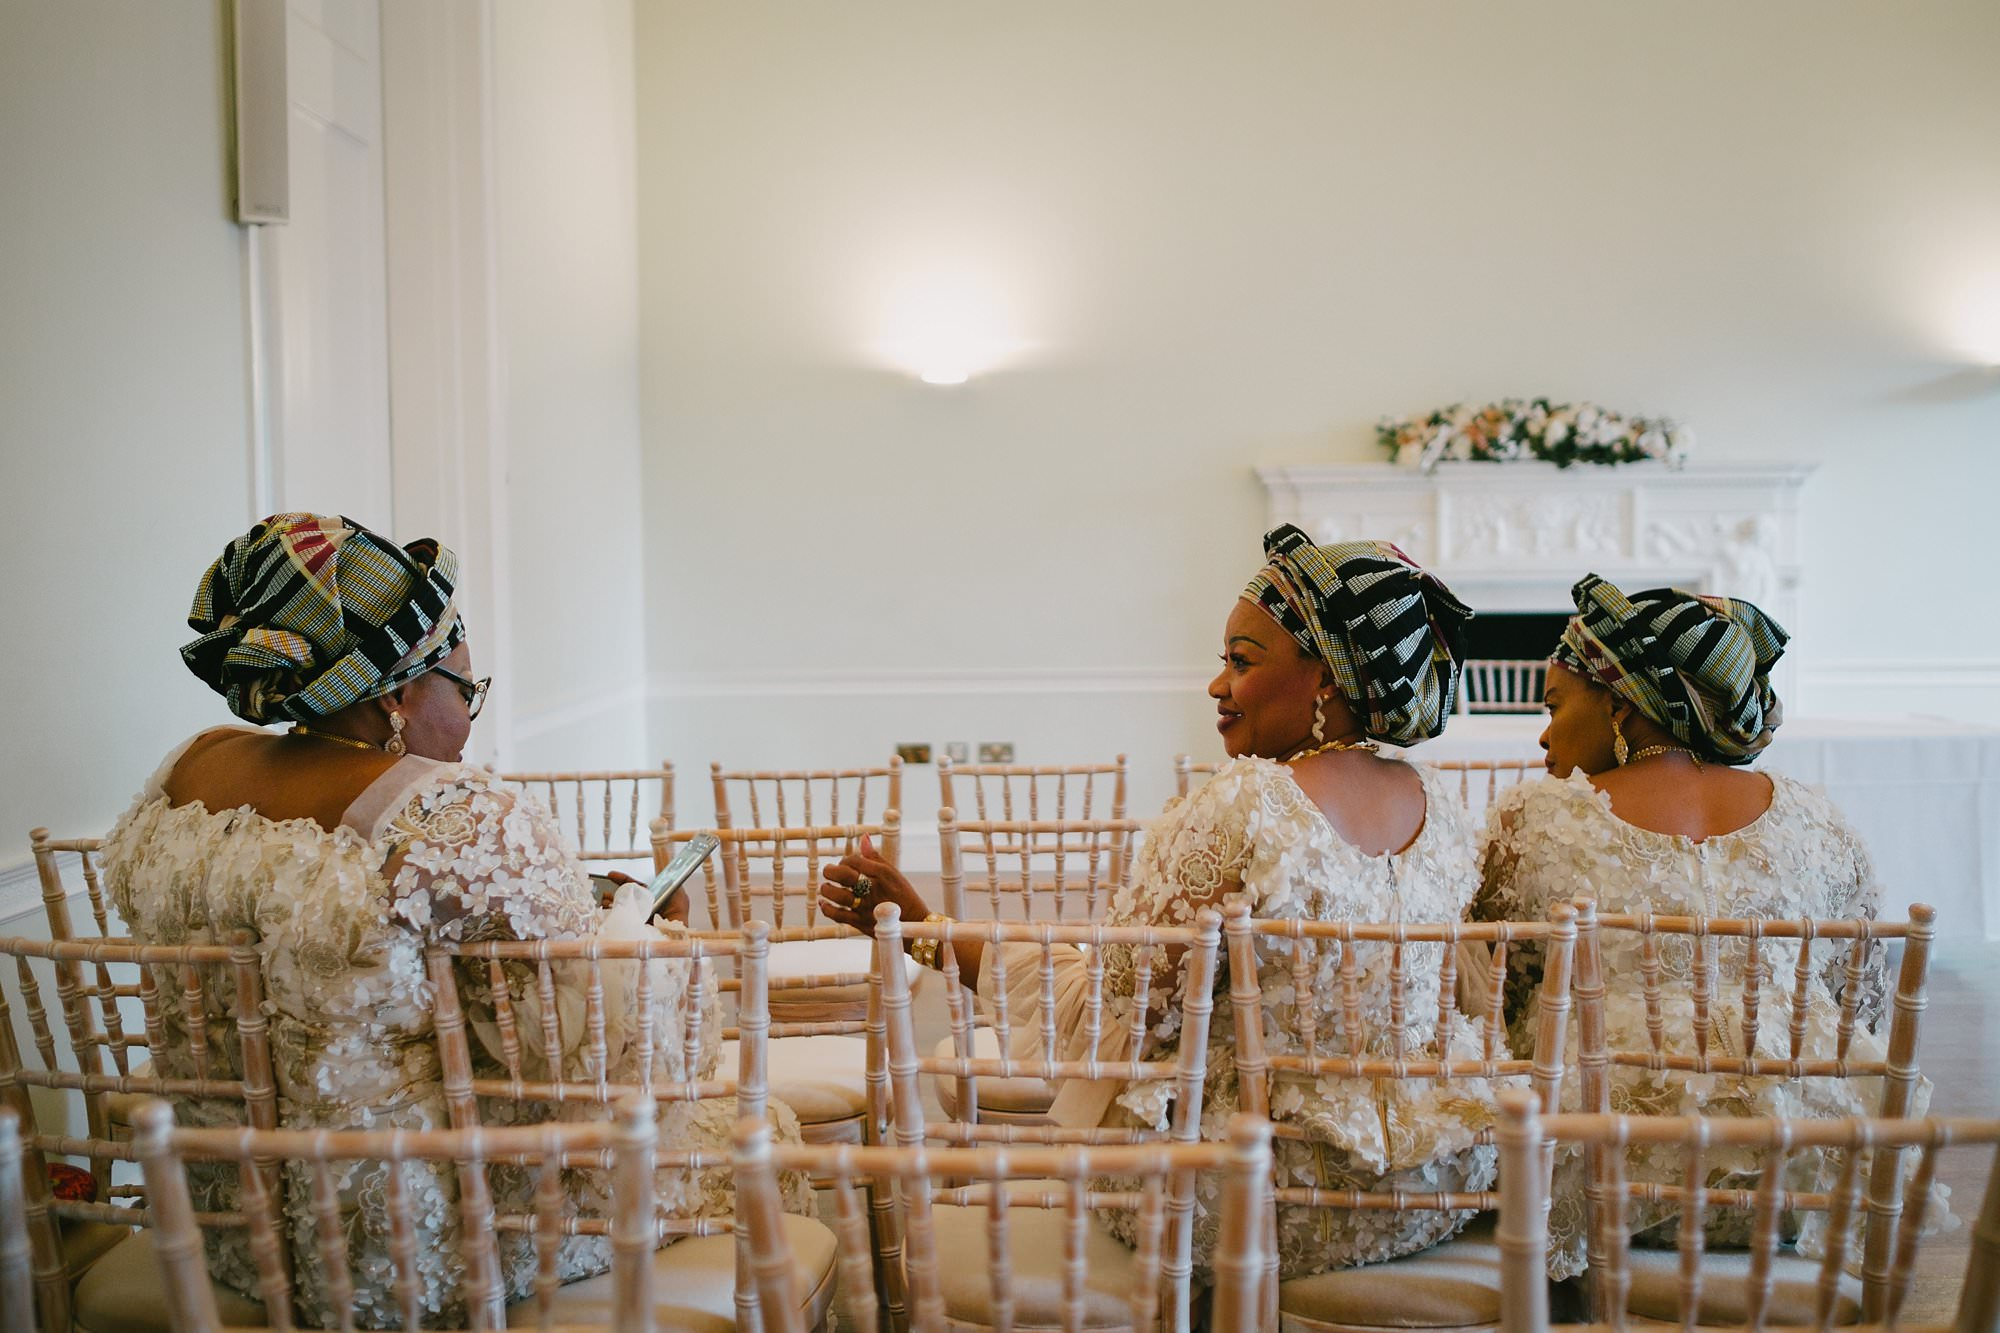 asia house london wedding photographer 016 - Rachel + Gabriel   Asia House Wedding Photography